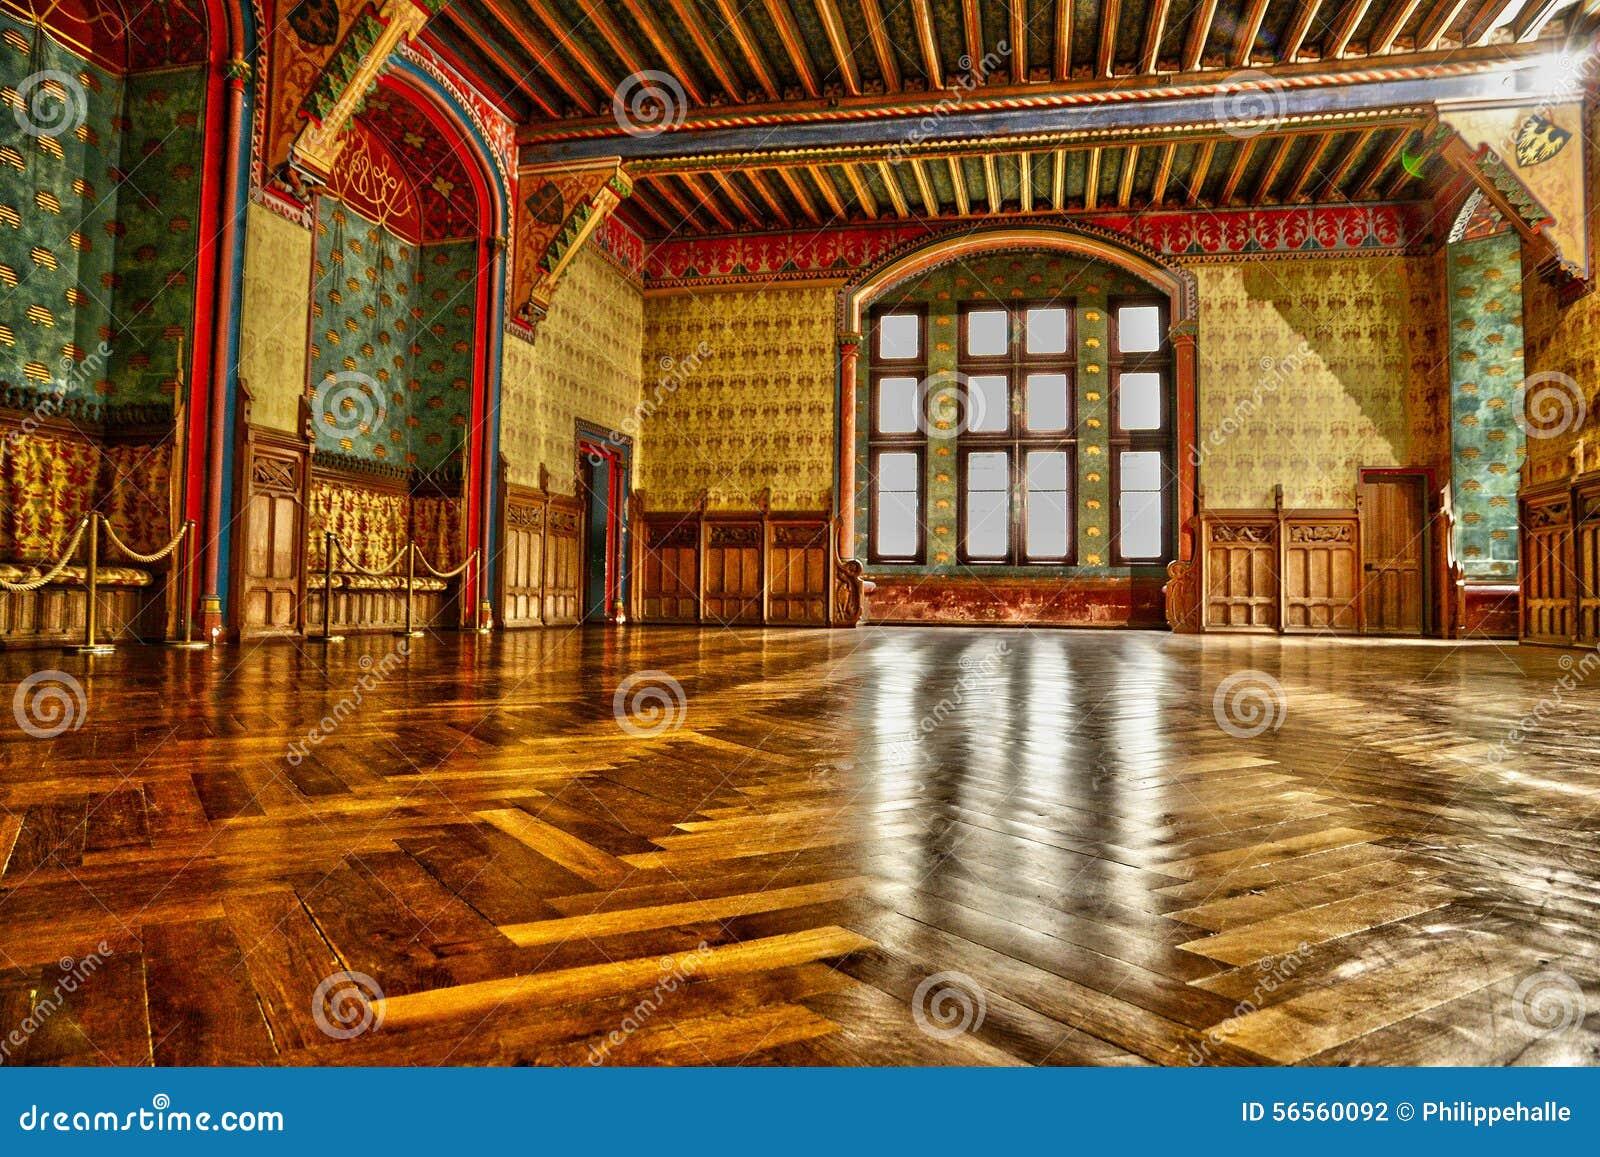 Download Γαλλία, ιστορικό κάστρο Pierrefonds σε Picardie Στοκ Εικόνες - εικόνα από ιστορικός, τουρισμός: 56560092